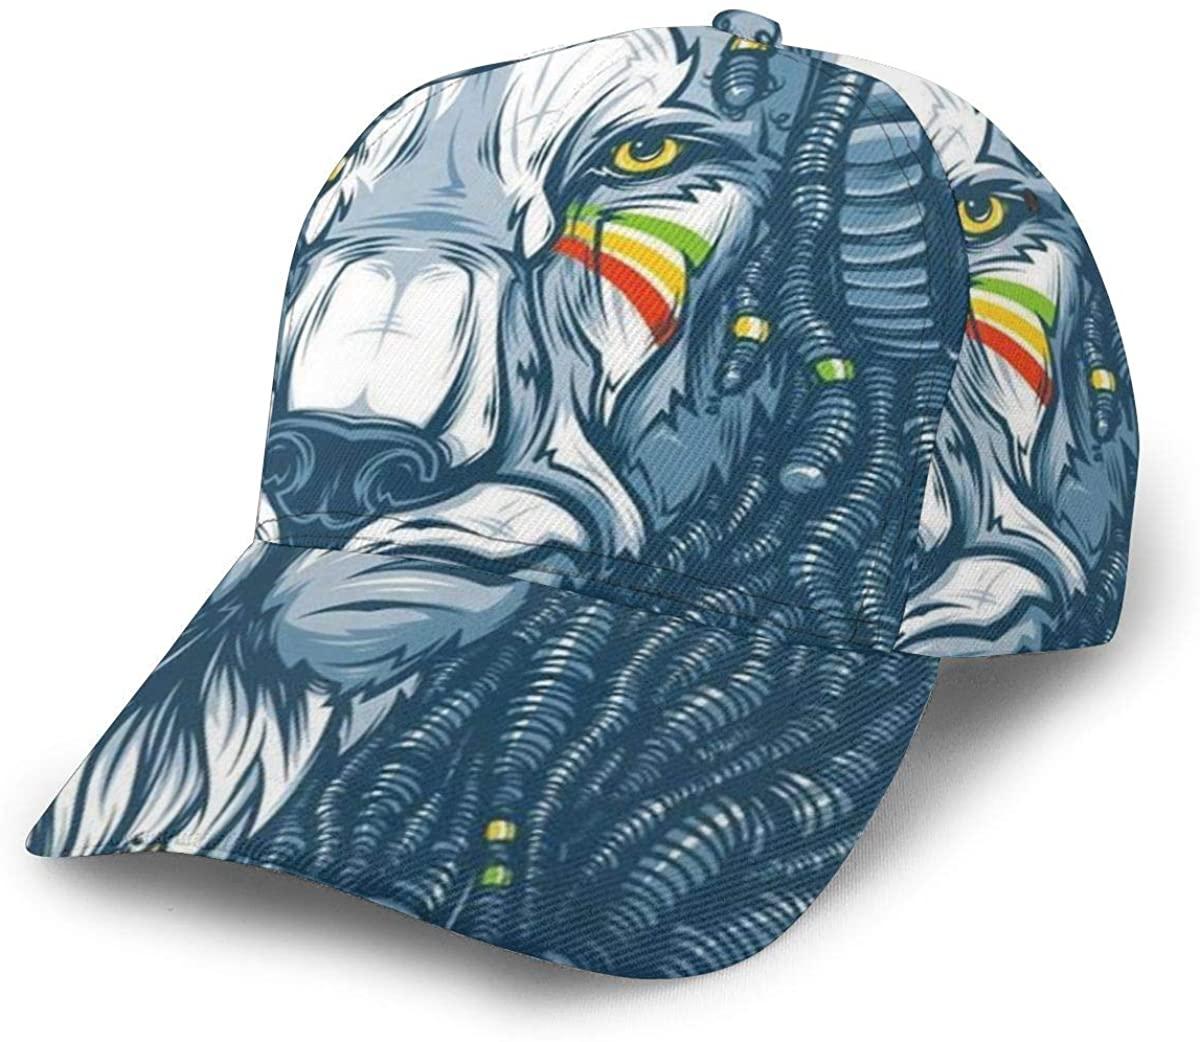 Unisex Adjustable Hat Classic Baseball Cap Printed Baseball Cap Hip Hop Hats